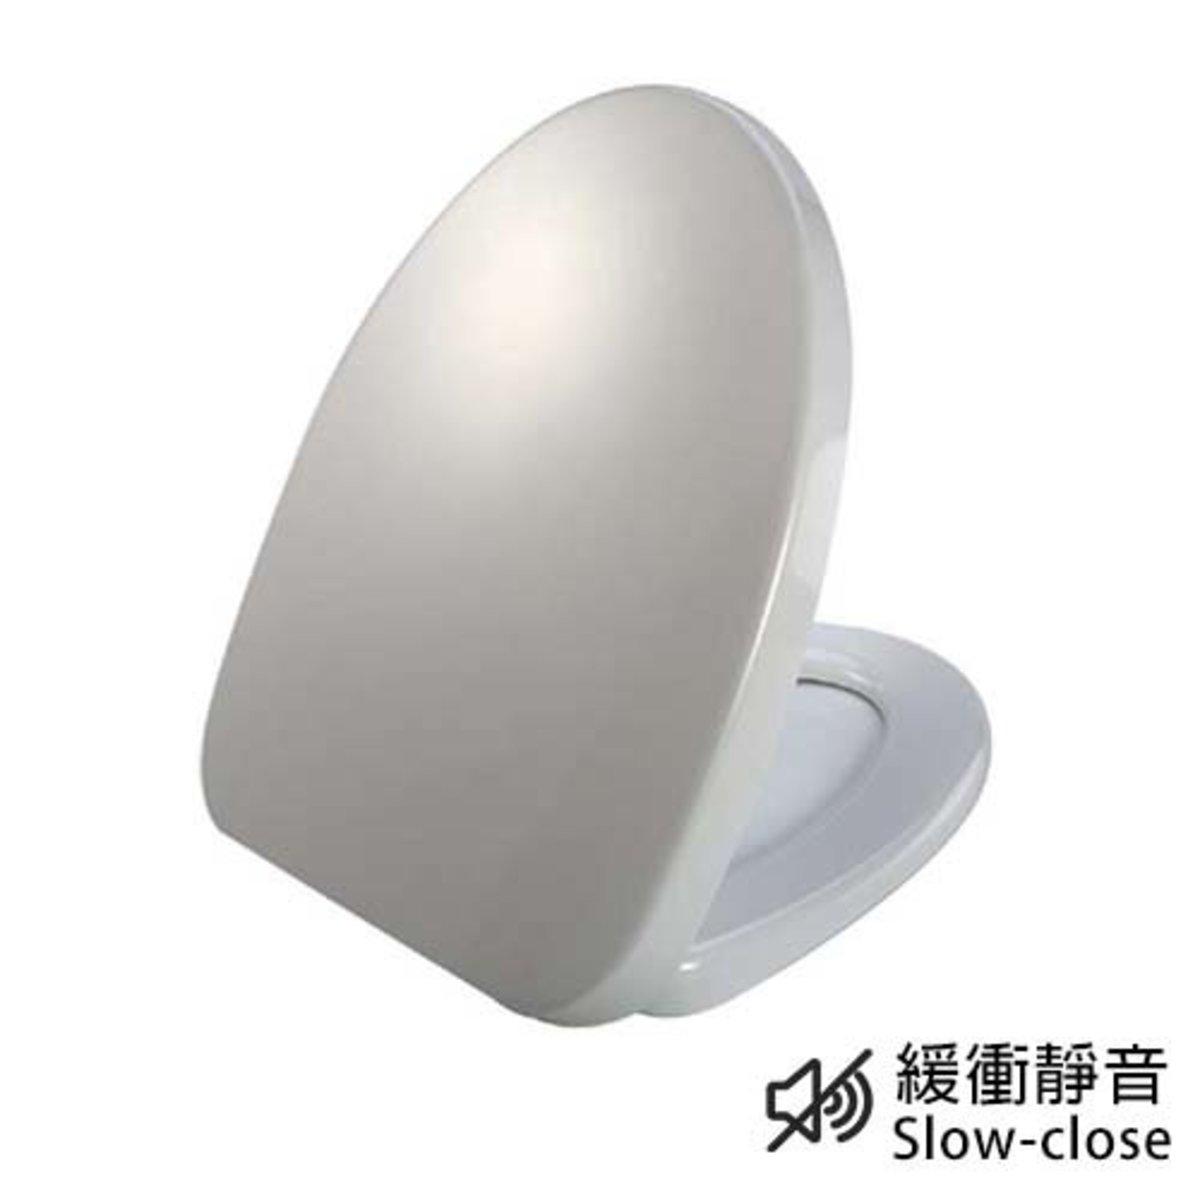 White Oil Pressure UF Toilet Seat 1A103